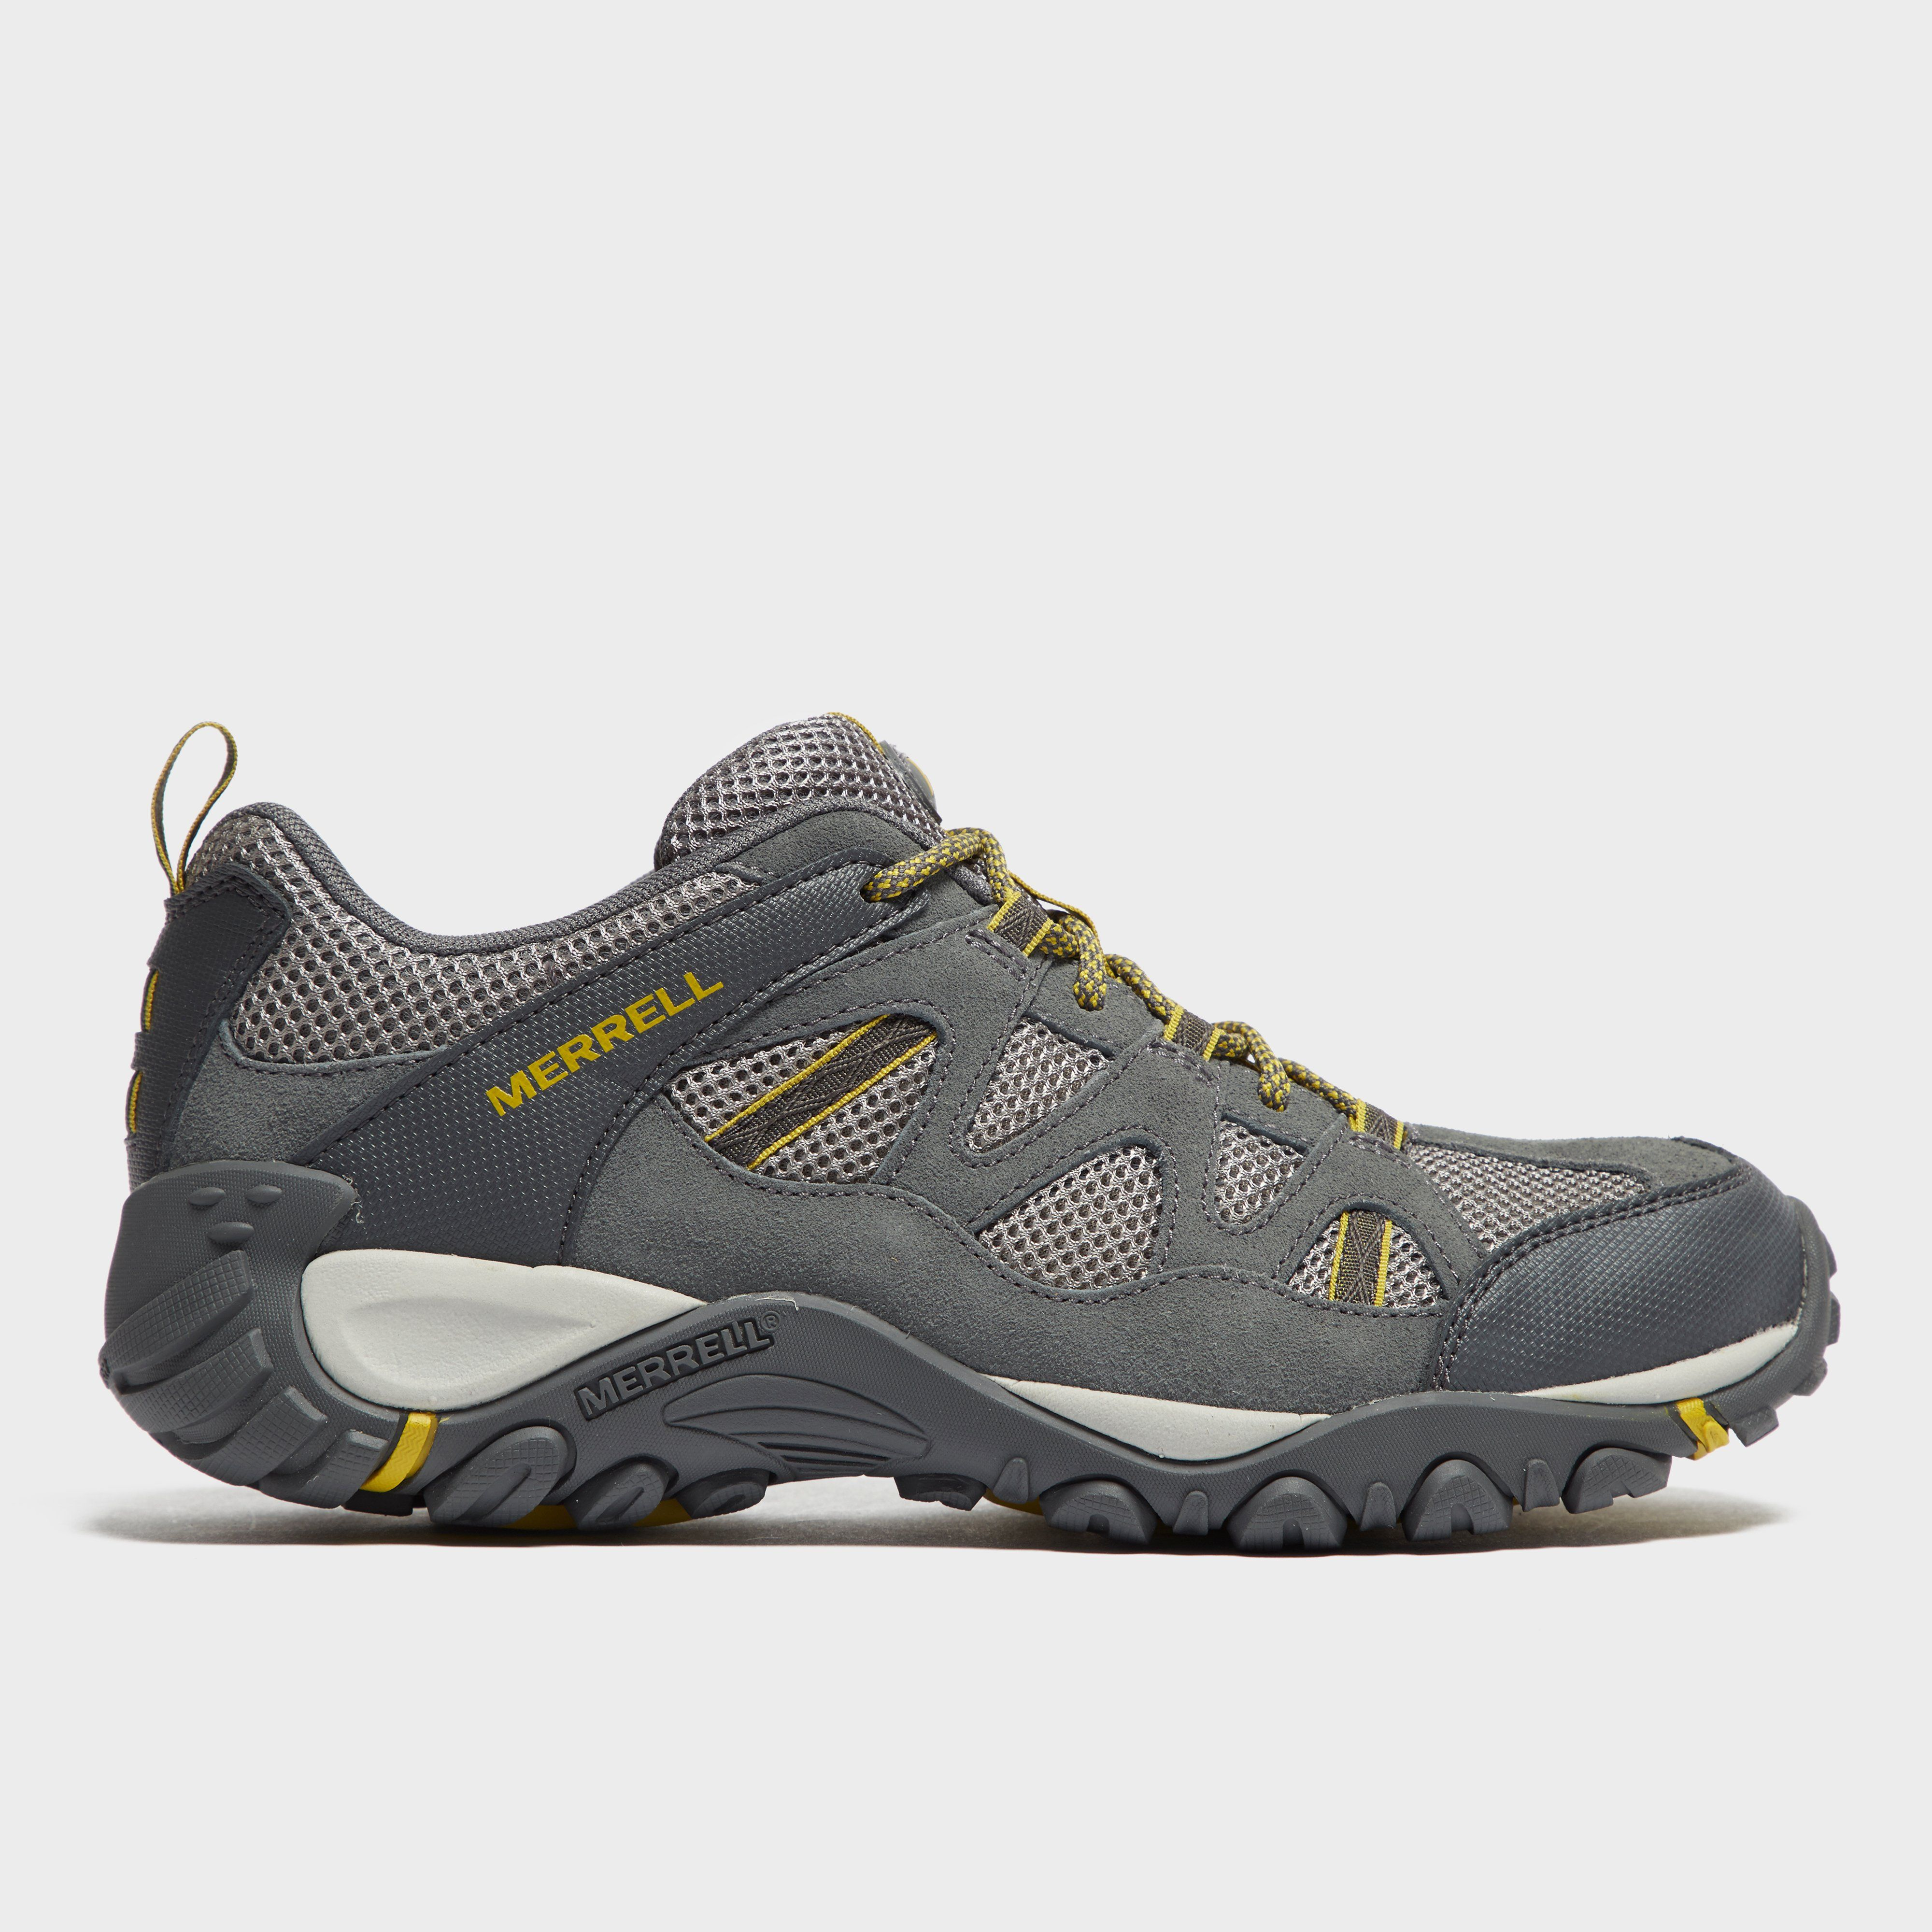 MERRELL Men's Yokota Trail Ventilator Hiking Shoe